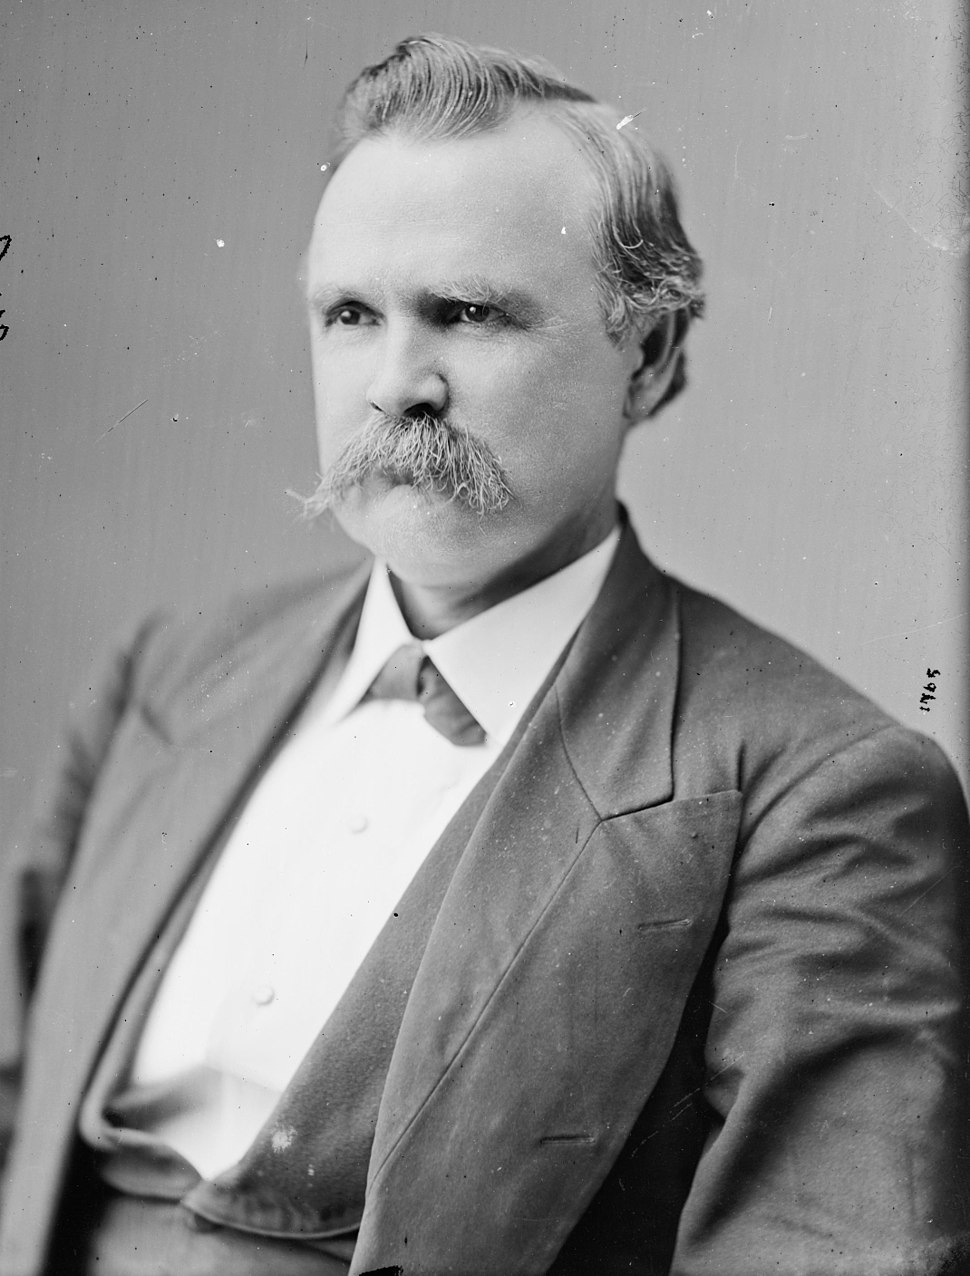 Roger Q. Mills - Brady-Handy